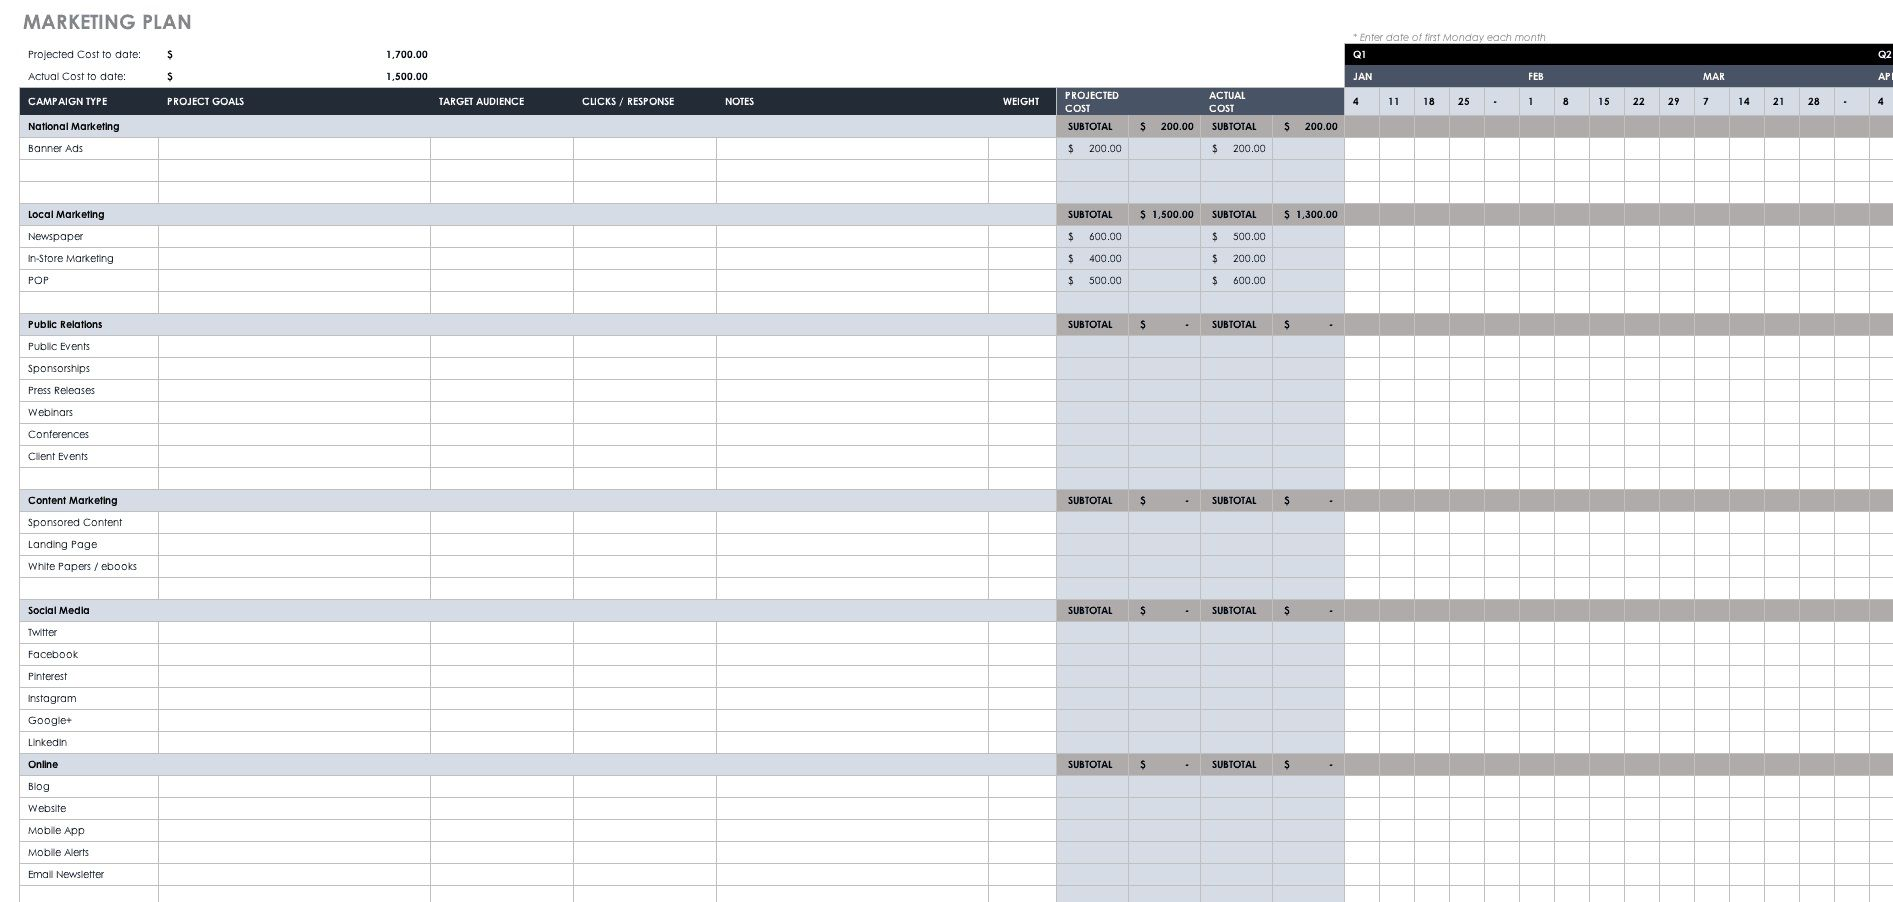 006 Marvelou Marketing Communication Plan Template Highest Clarity  Example Pdf Excel IntegratedFull